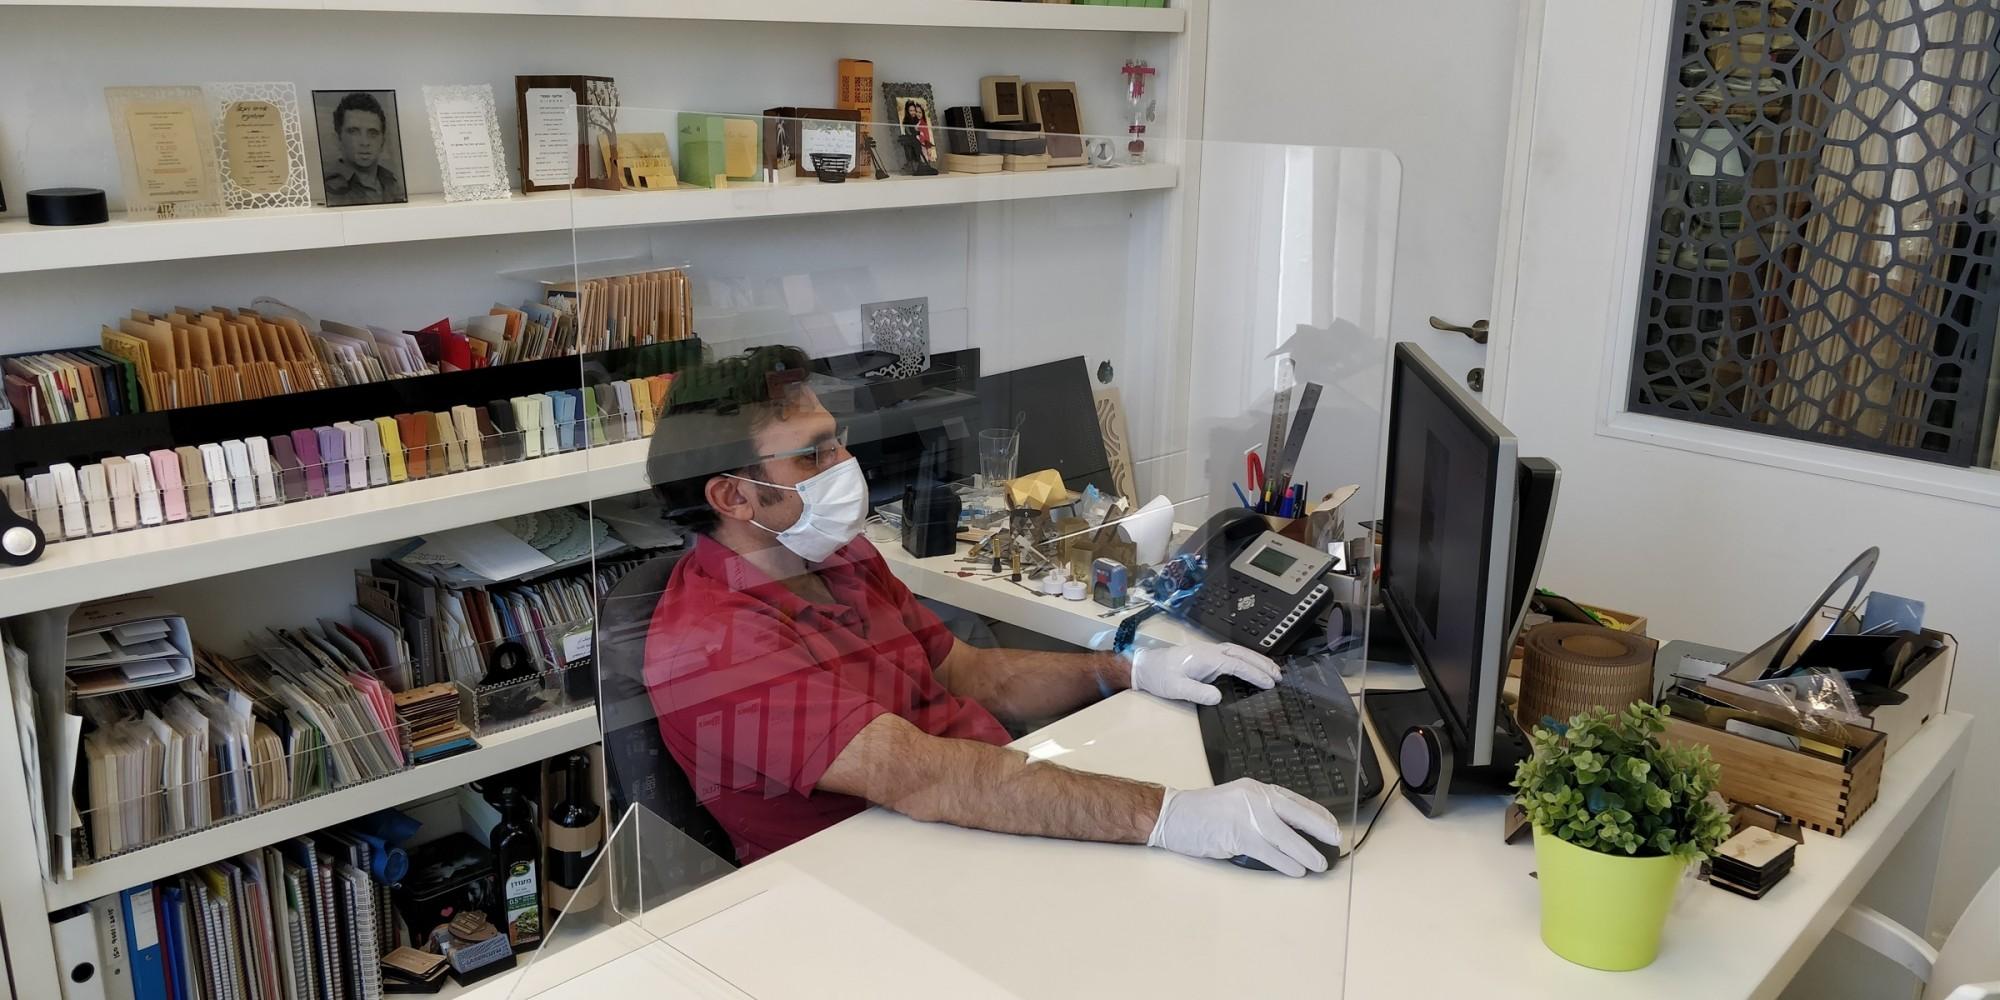 Desktop coronavirus protective shield - Acrylic